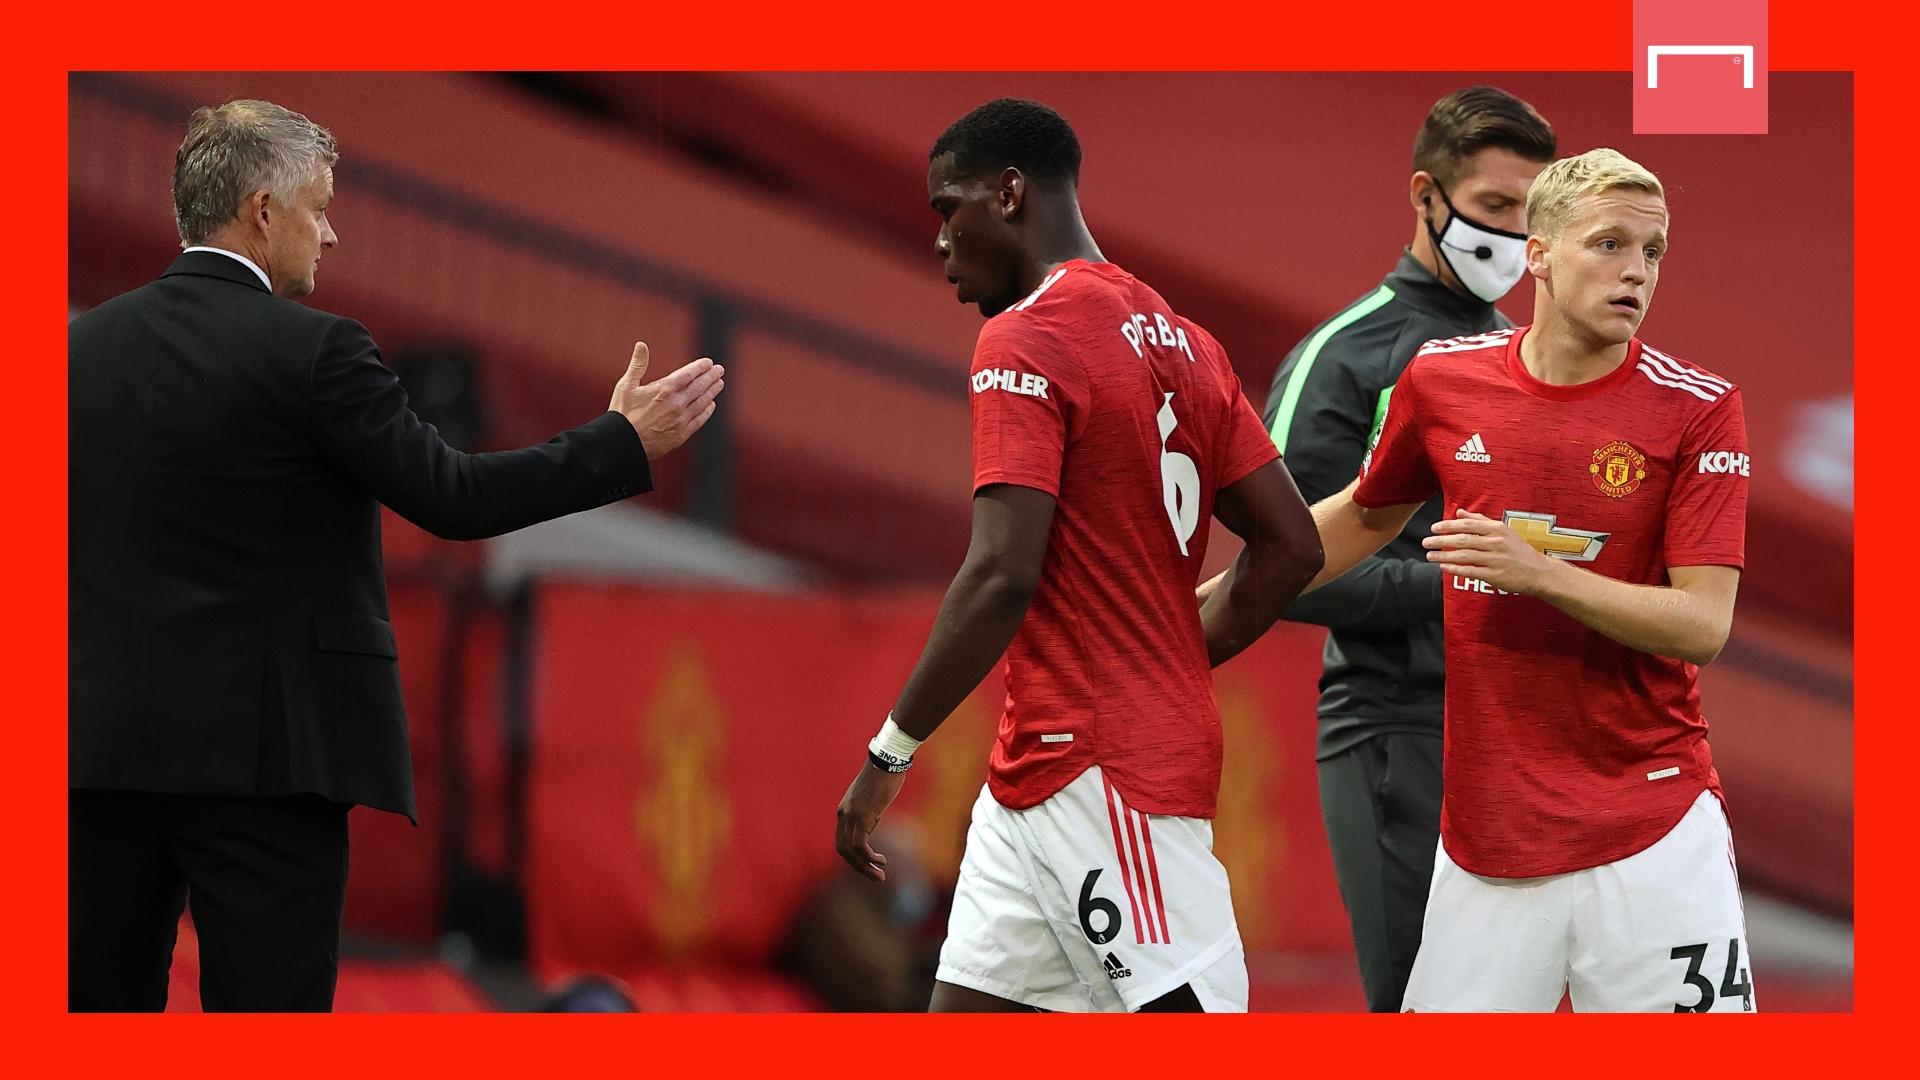 Man United beat Brighton again, Calvert-Lewin hat-trick